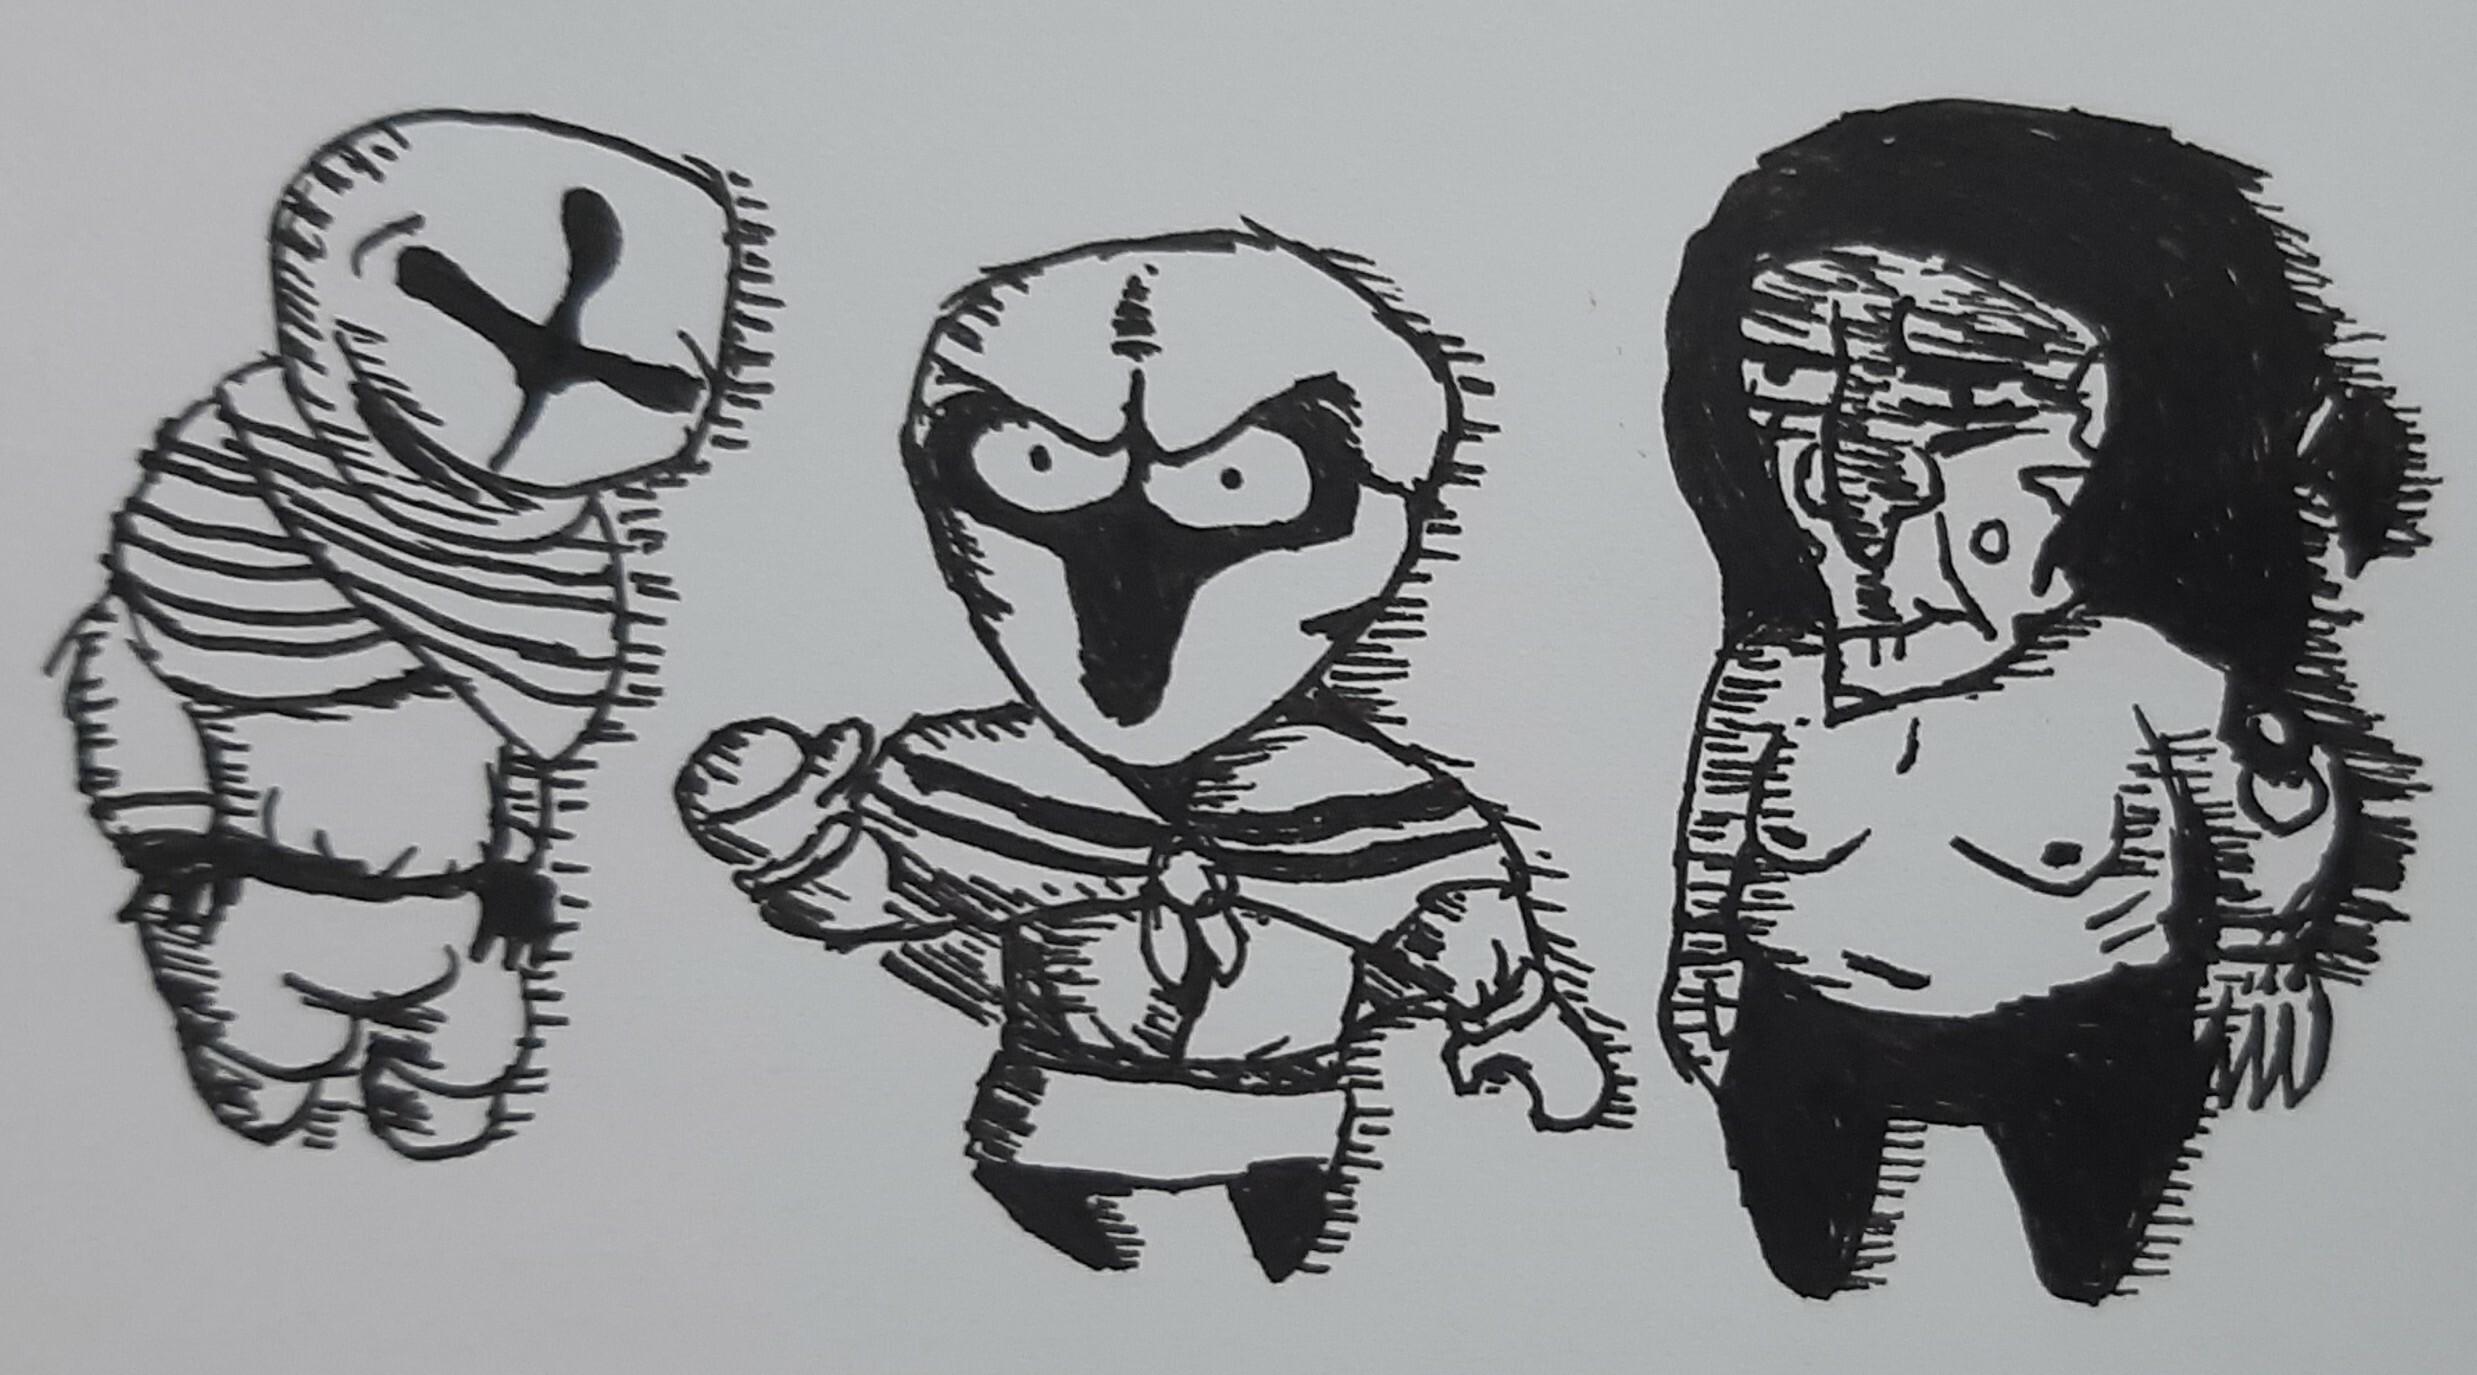 Plumeria Union cultists